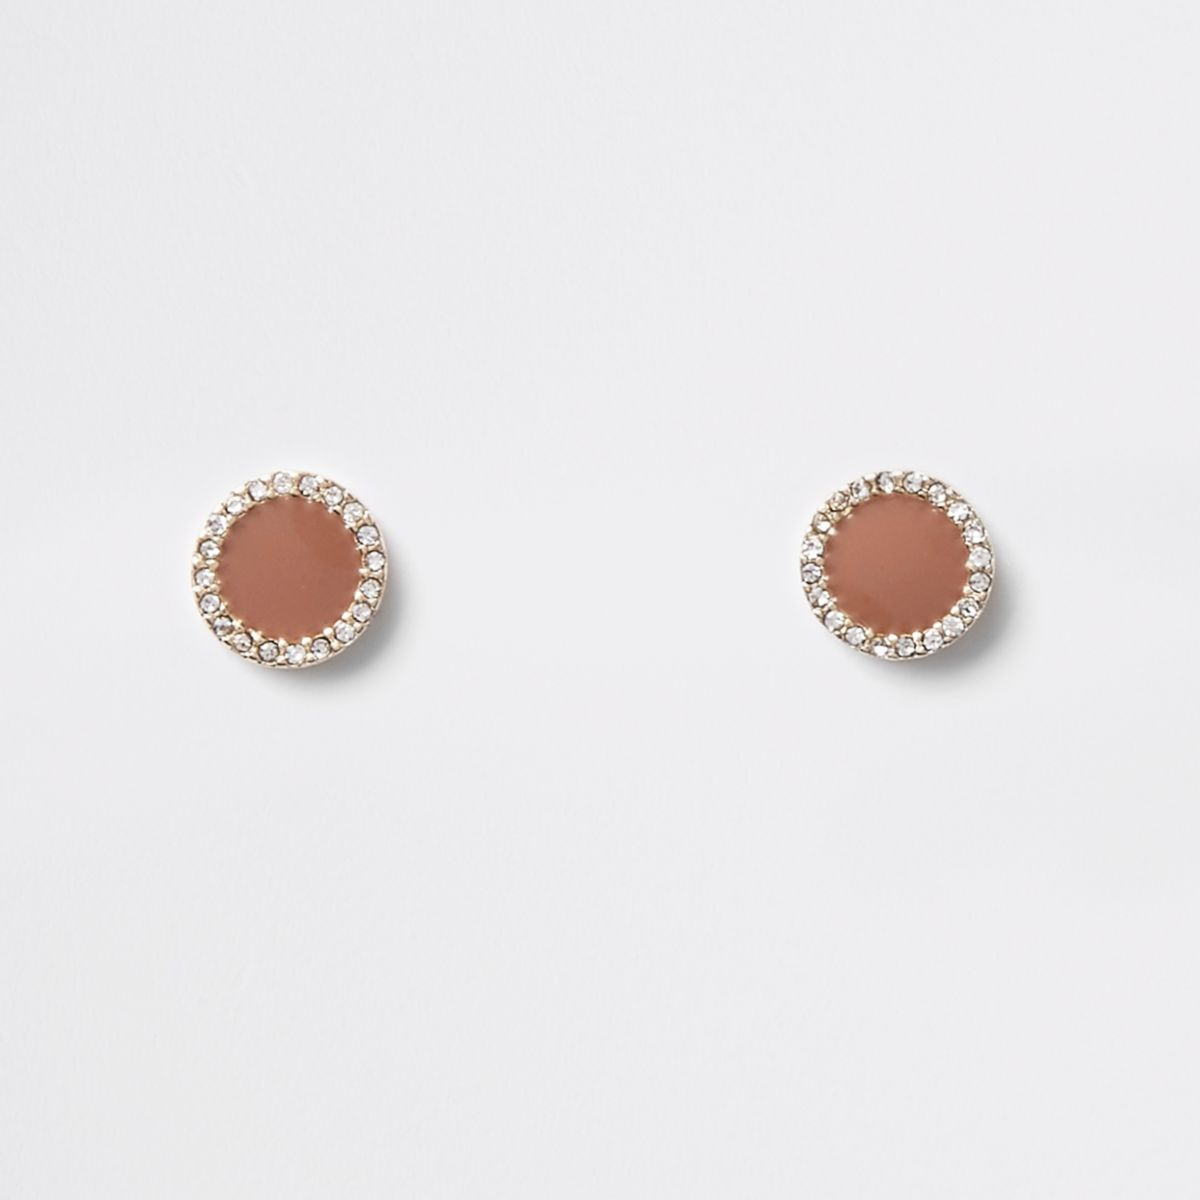 Brown mini round rhinestone stud earrings